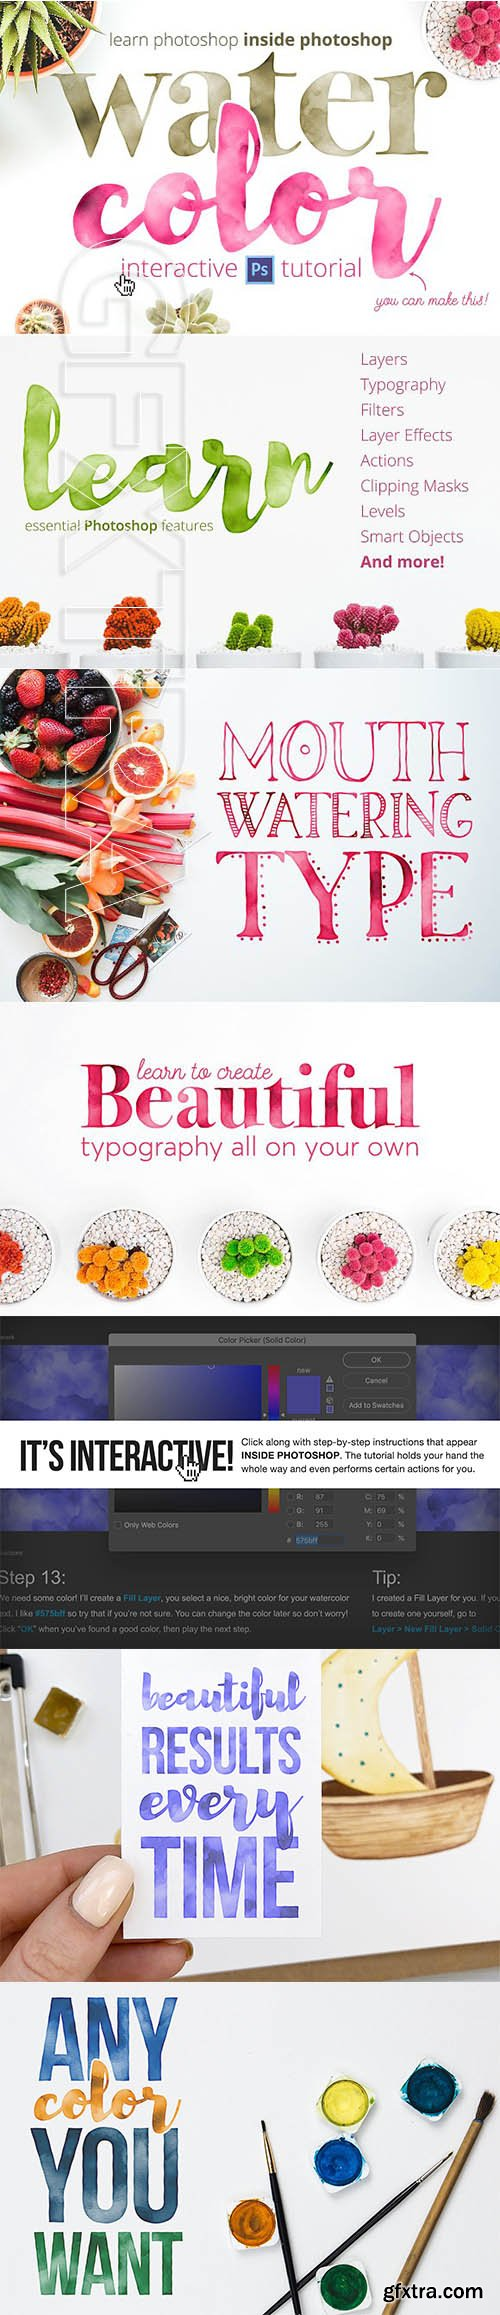 CreativeMarket - Learn Photoshop Watercolor Tutorial 1274973